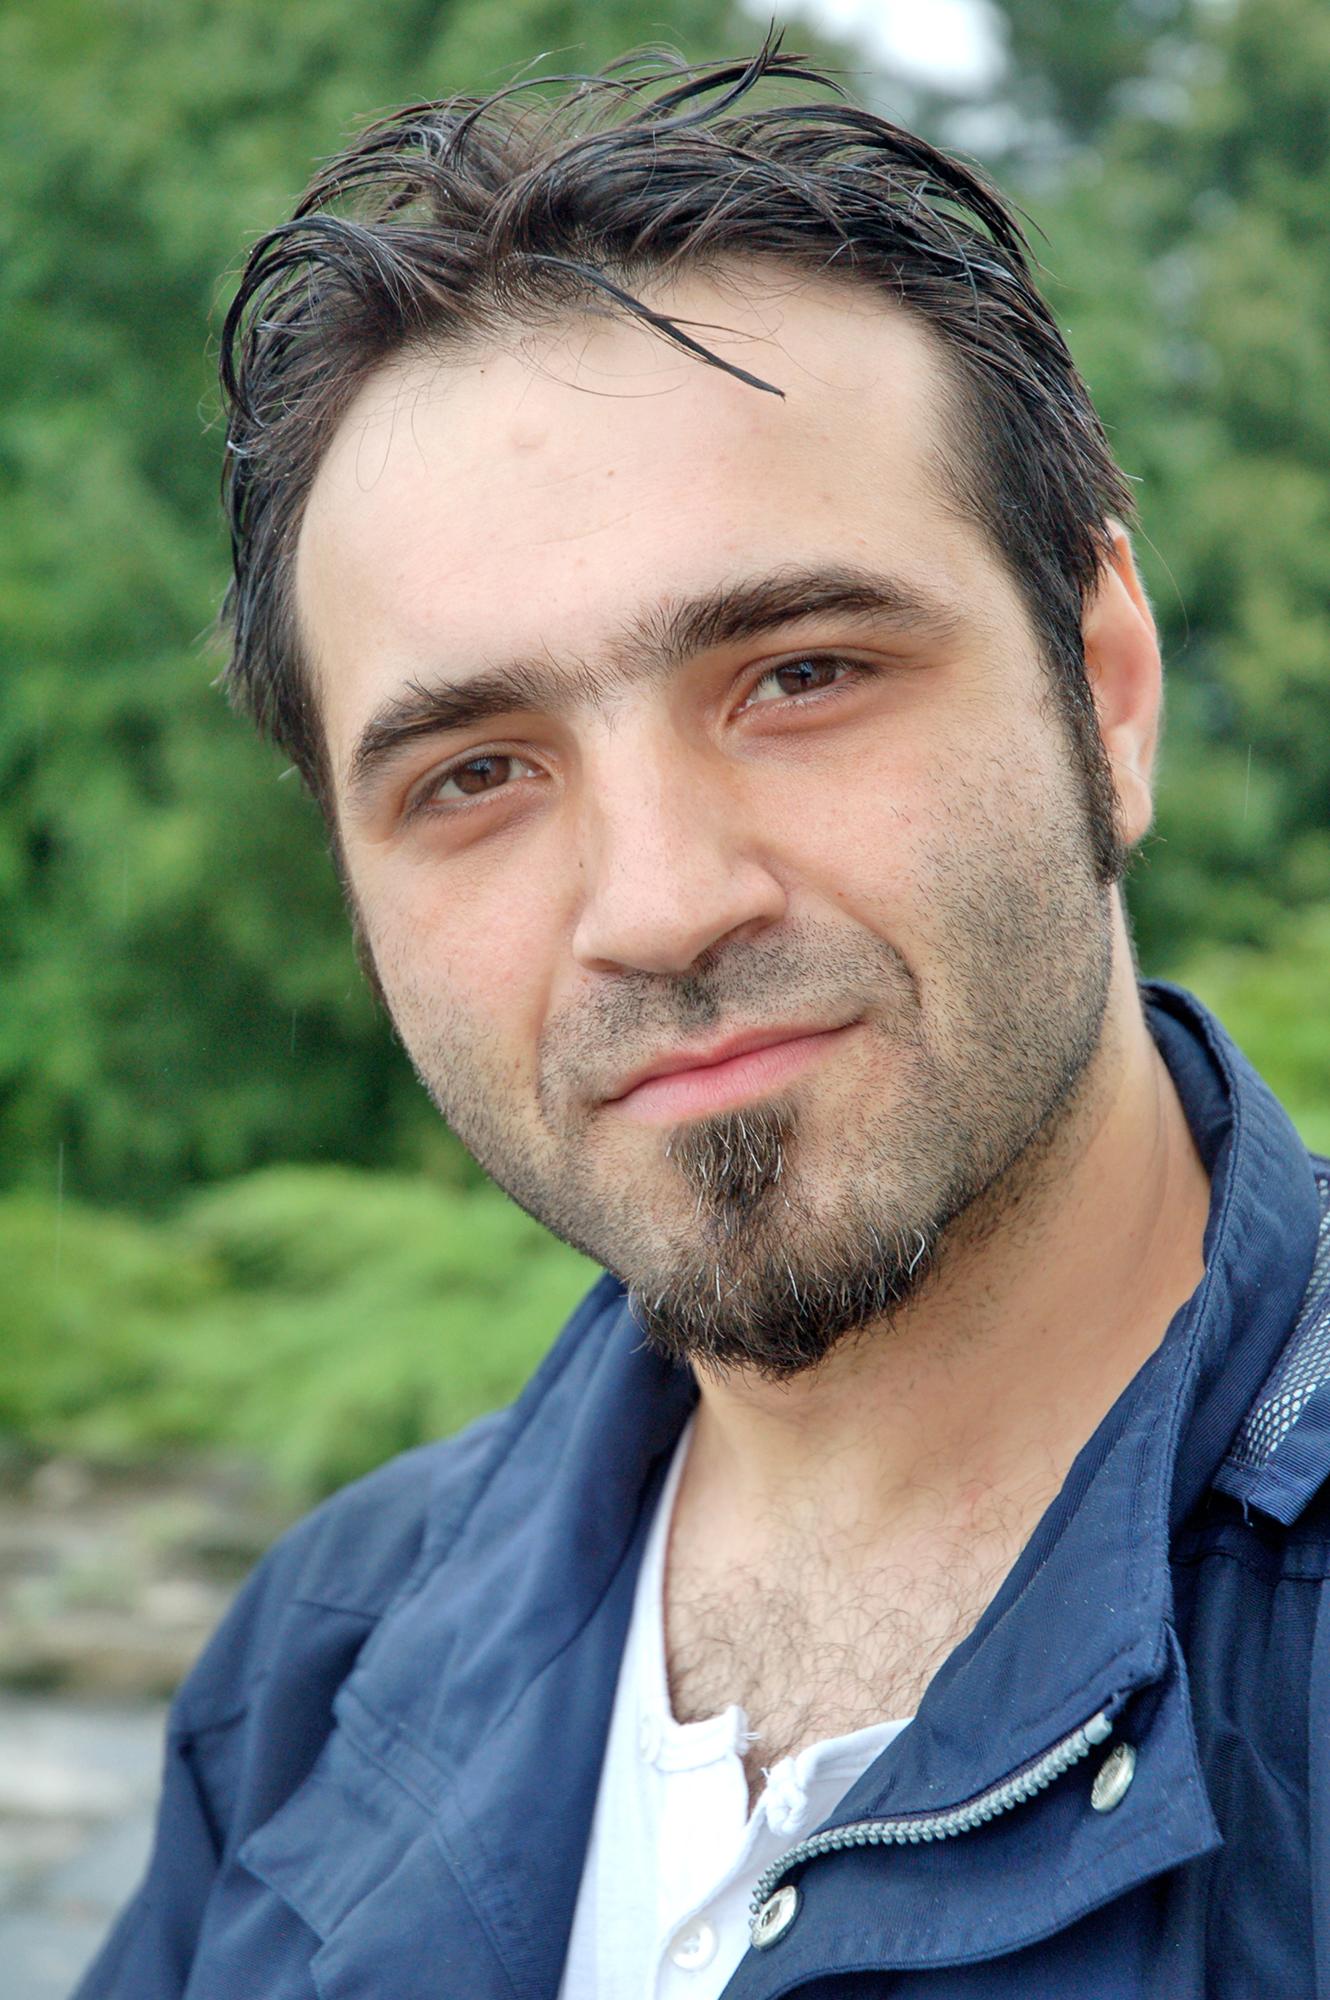 Samir Sabic - musician